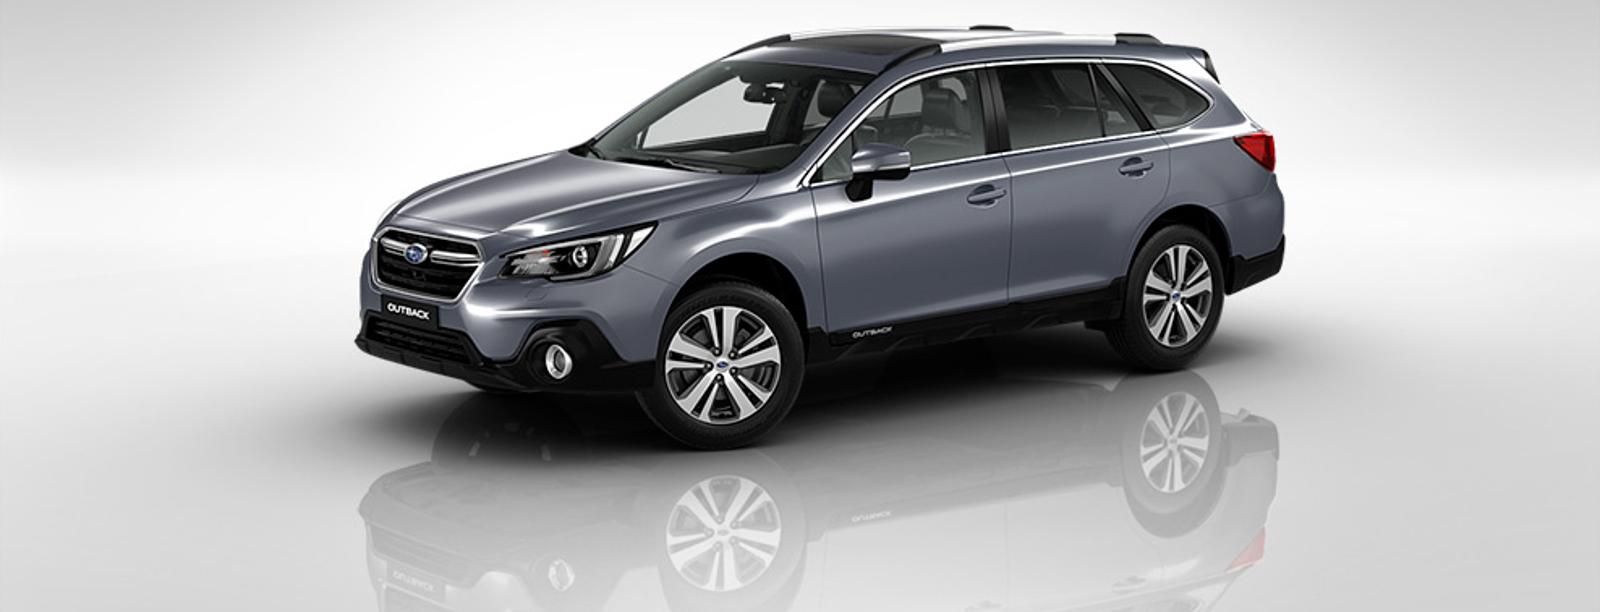 Perfil Subaru Outback